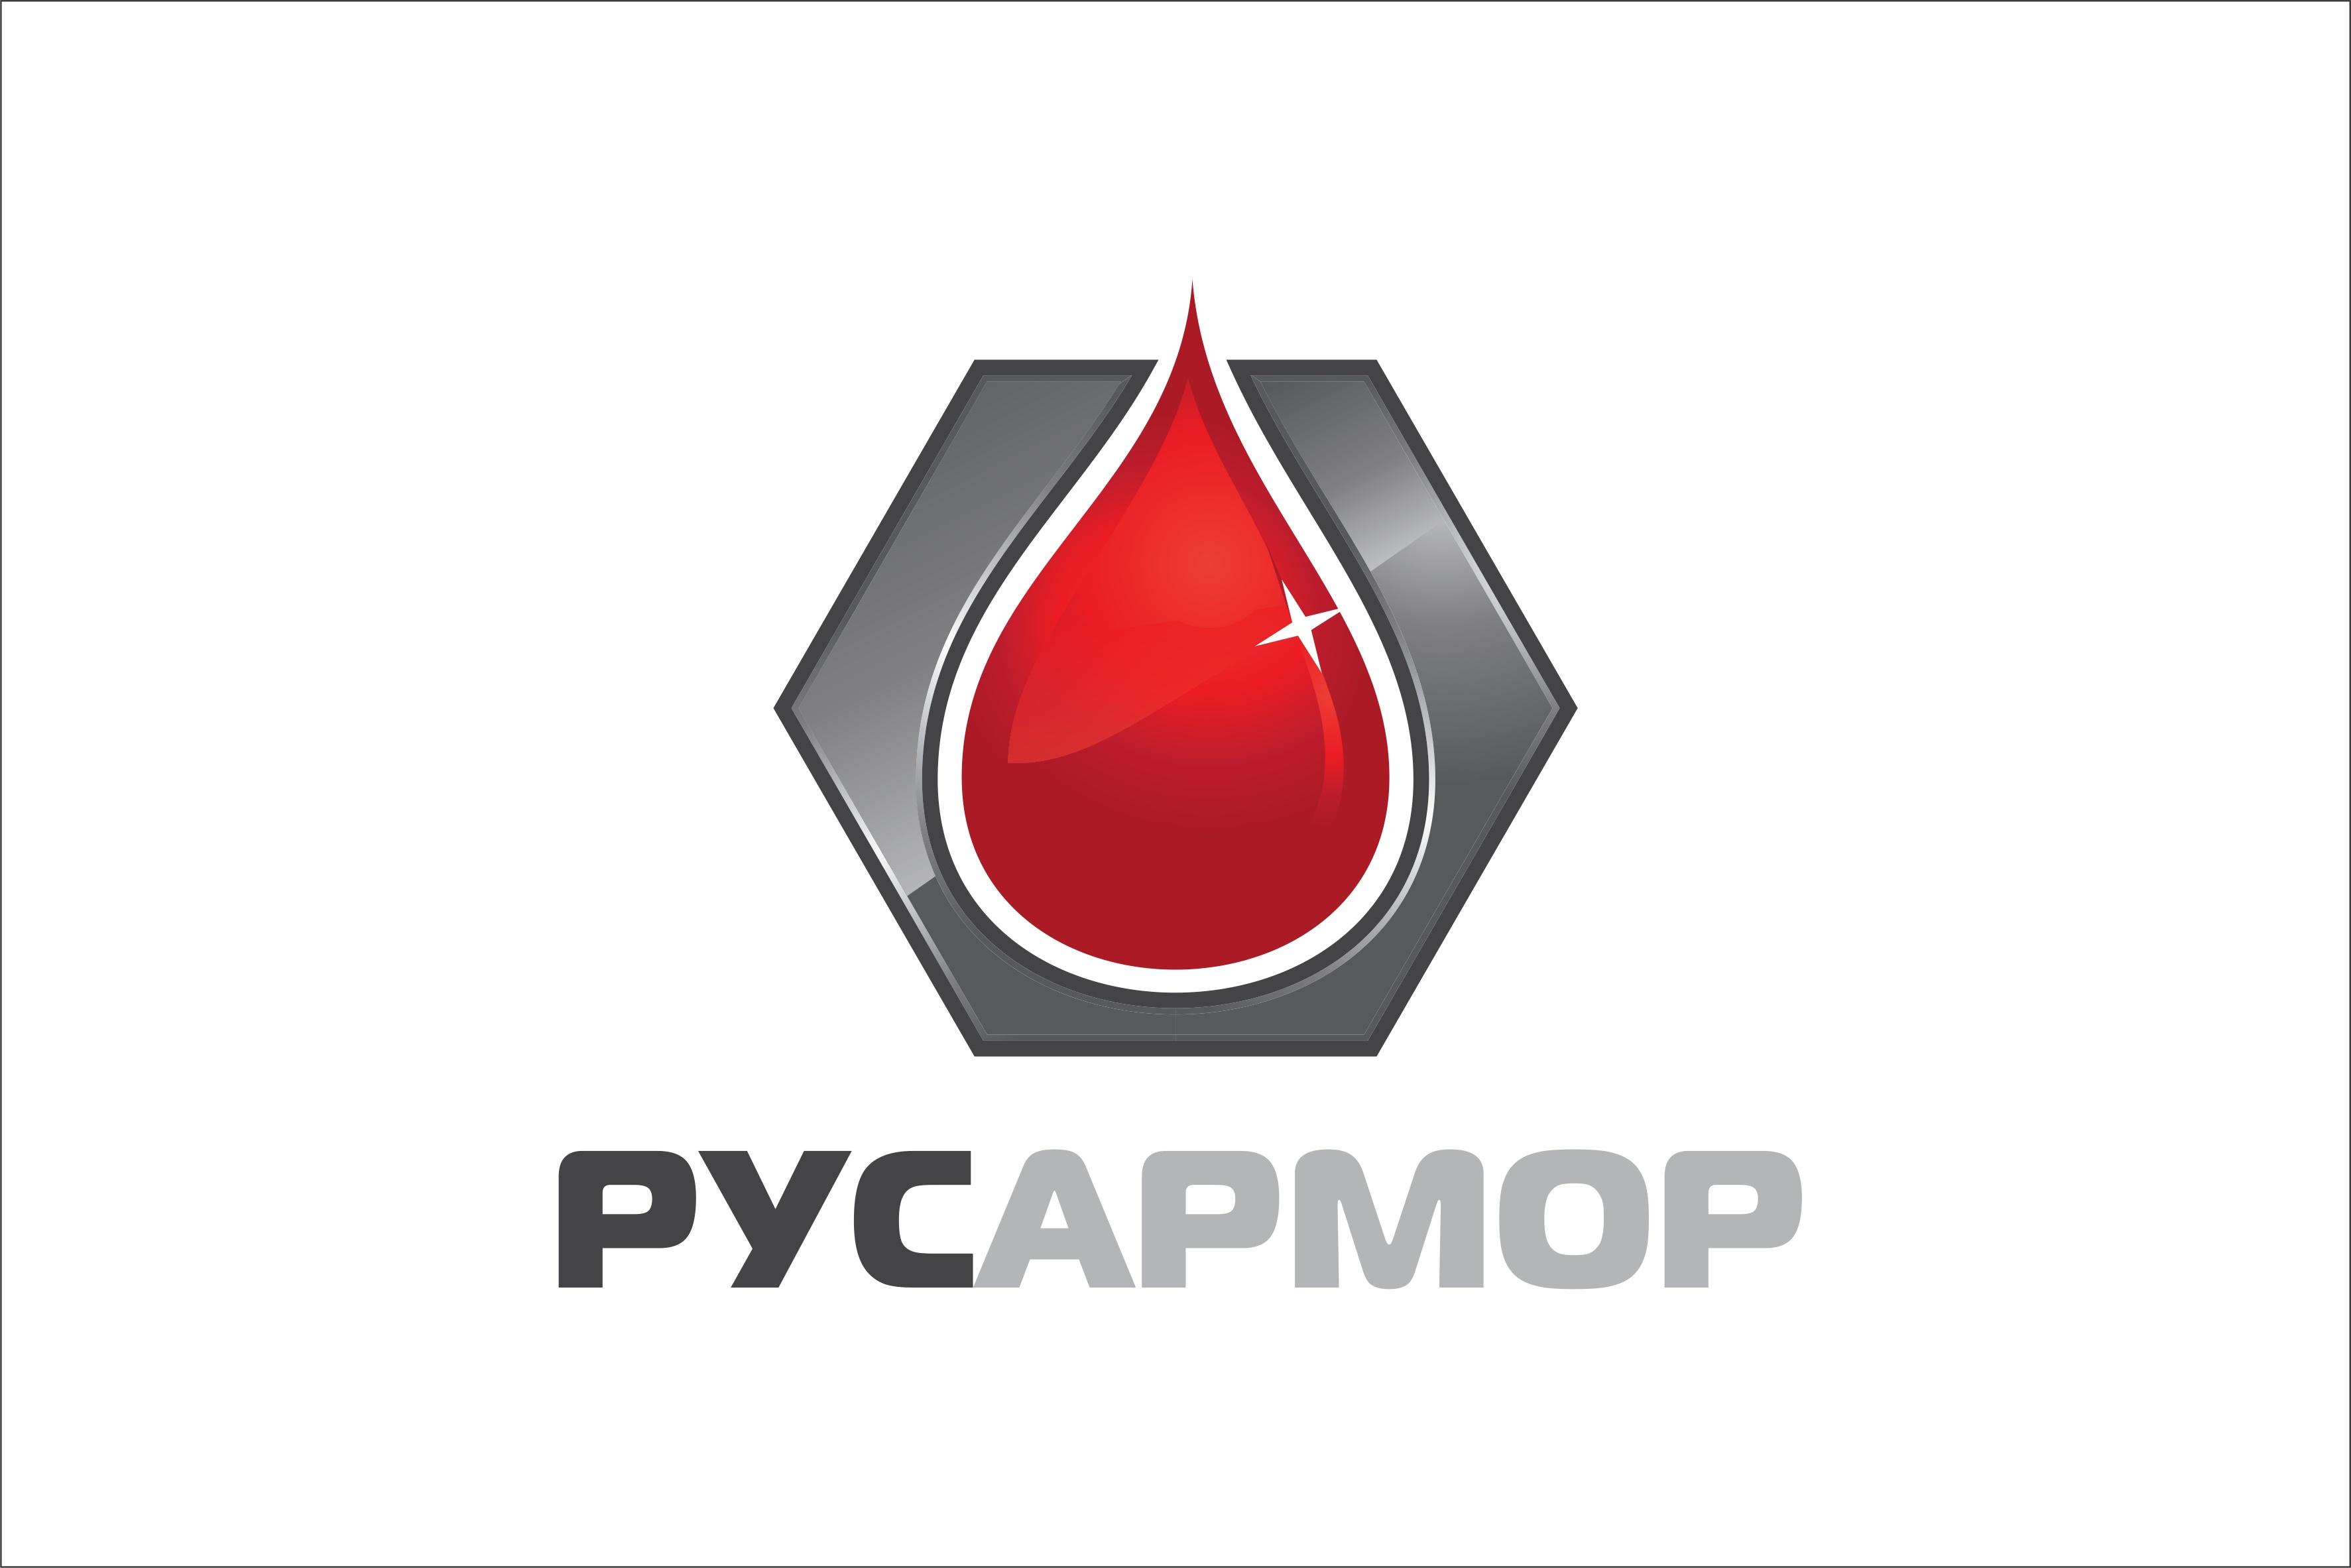 Разработка логотипа технологического стартапа РУСАРМОР фото f_9235a0f437dbf793.jpg